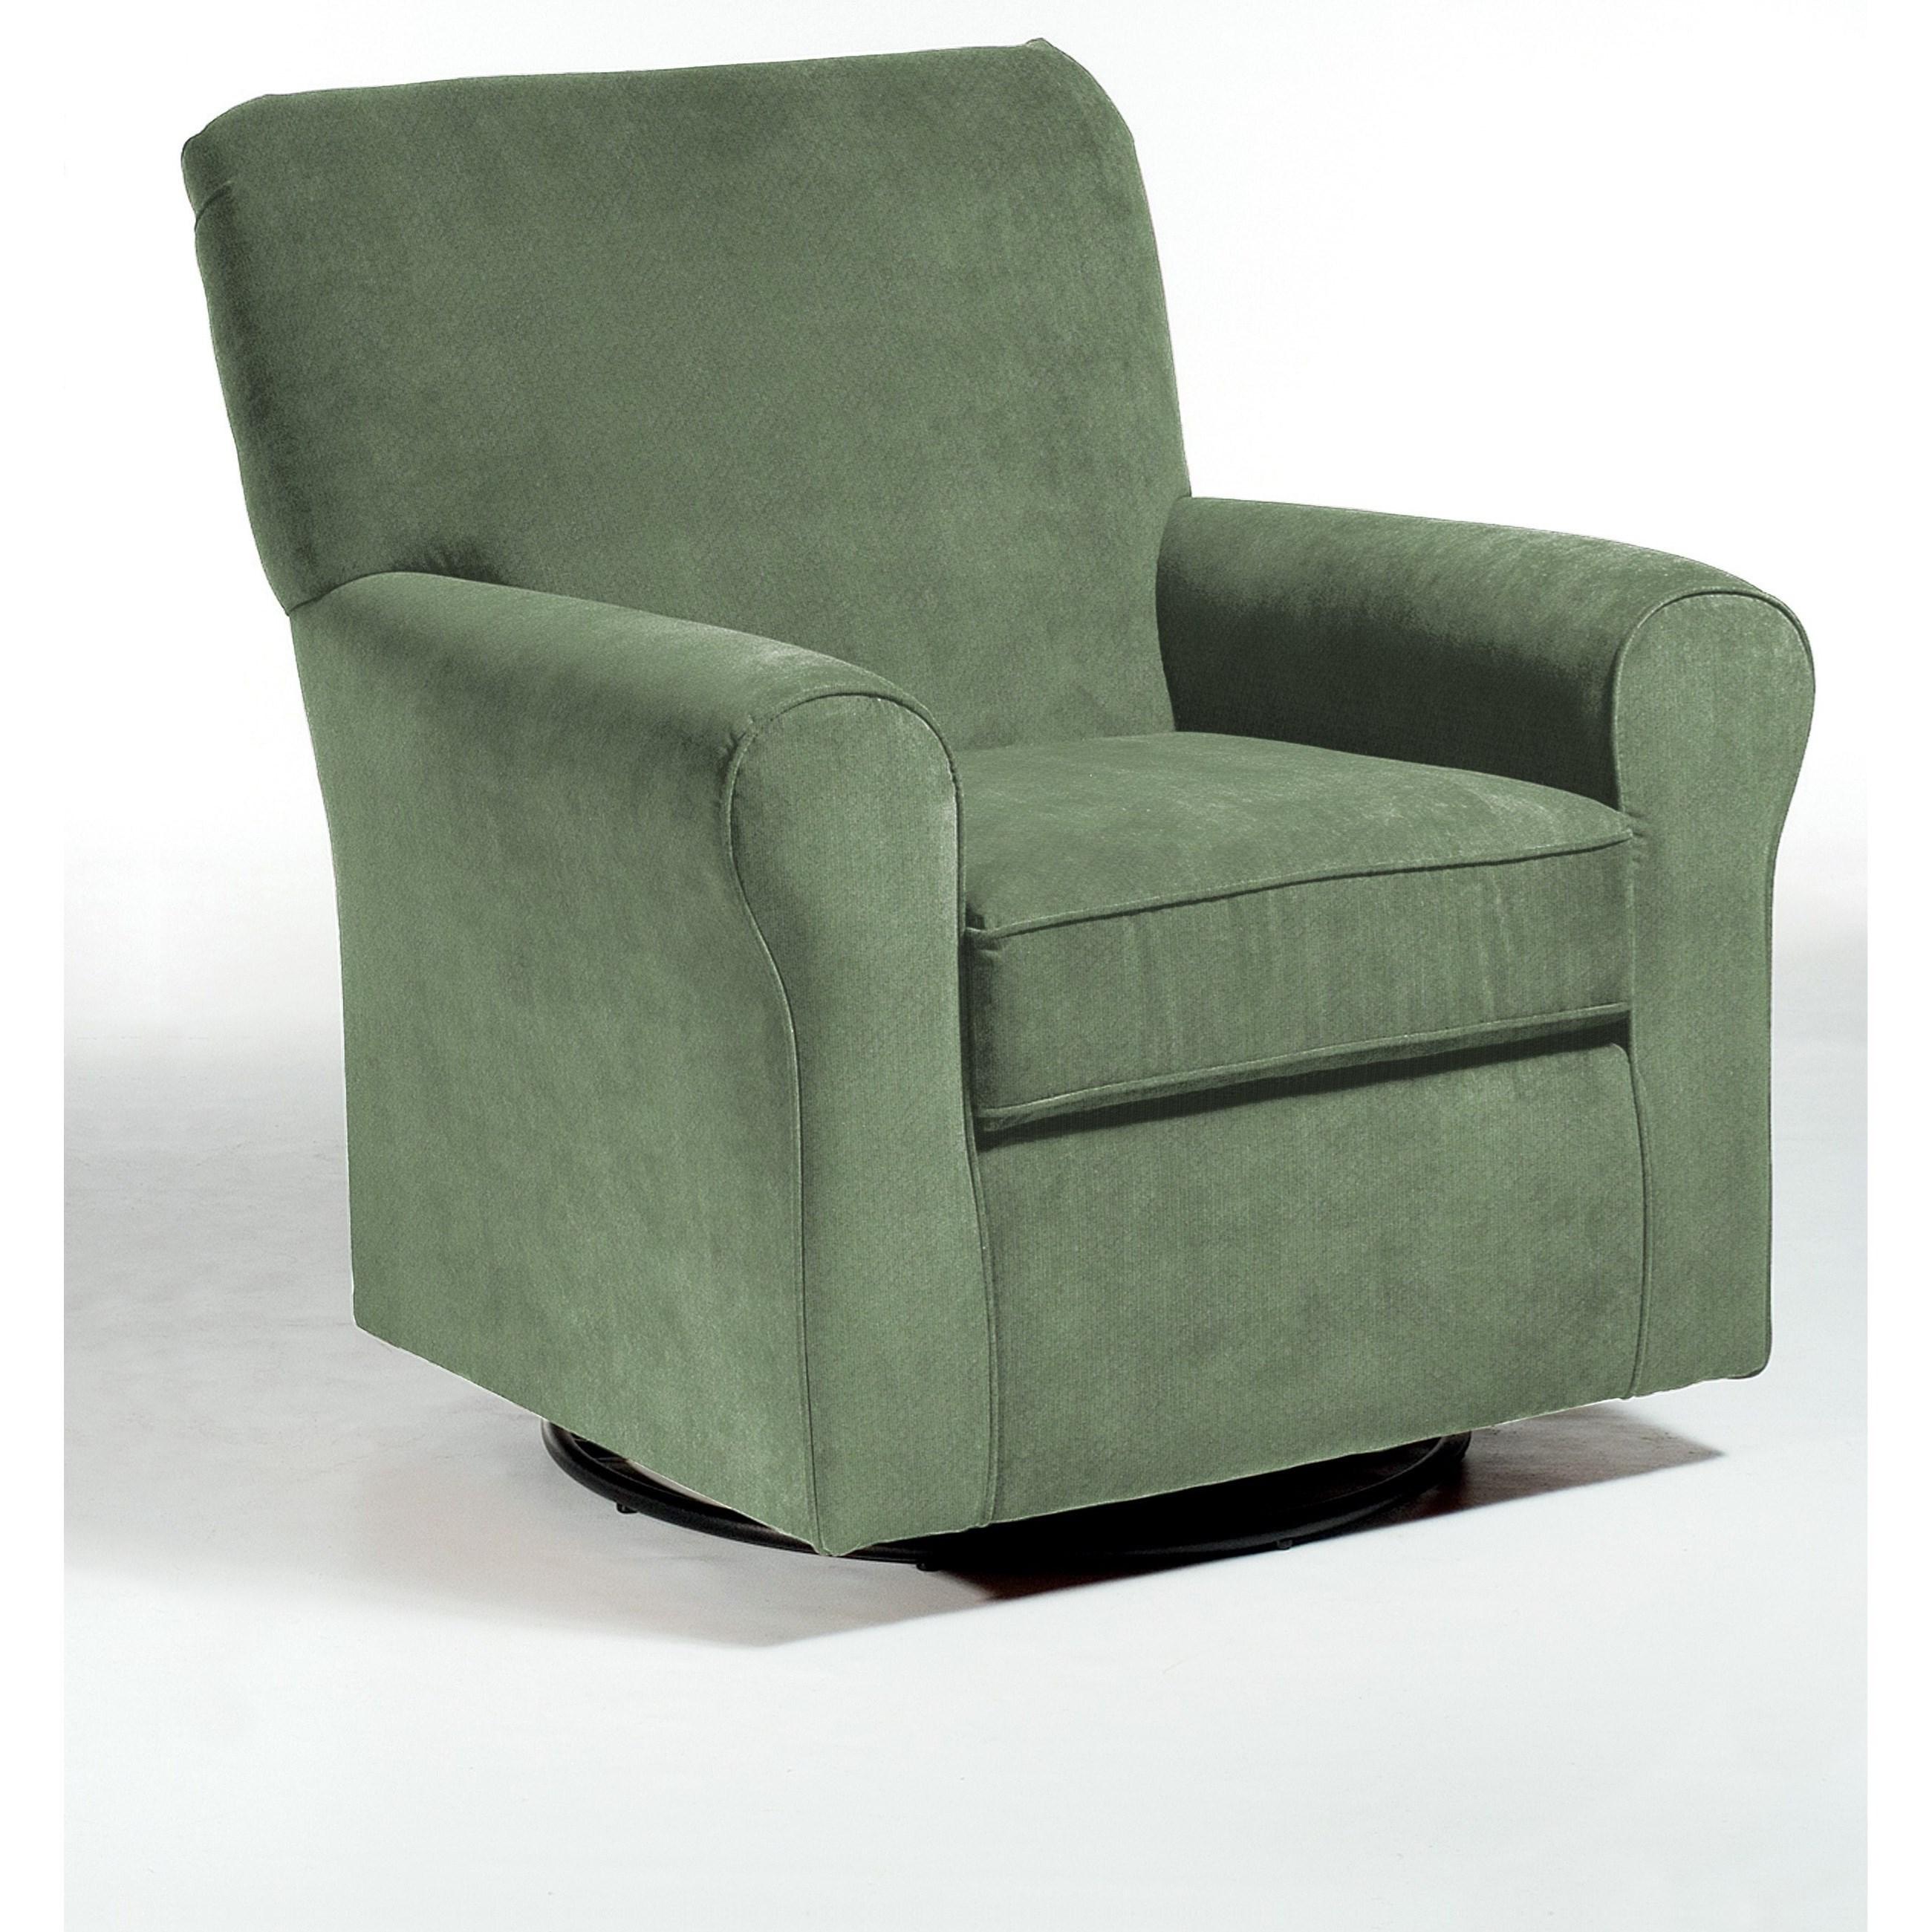 Swivel Glide Chairs Hagen Swivel Glide by Best Home Furnishings at Fashion Furniture